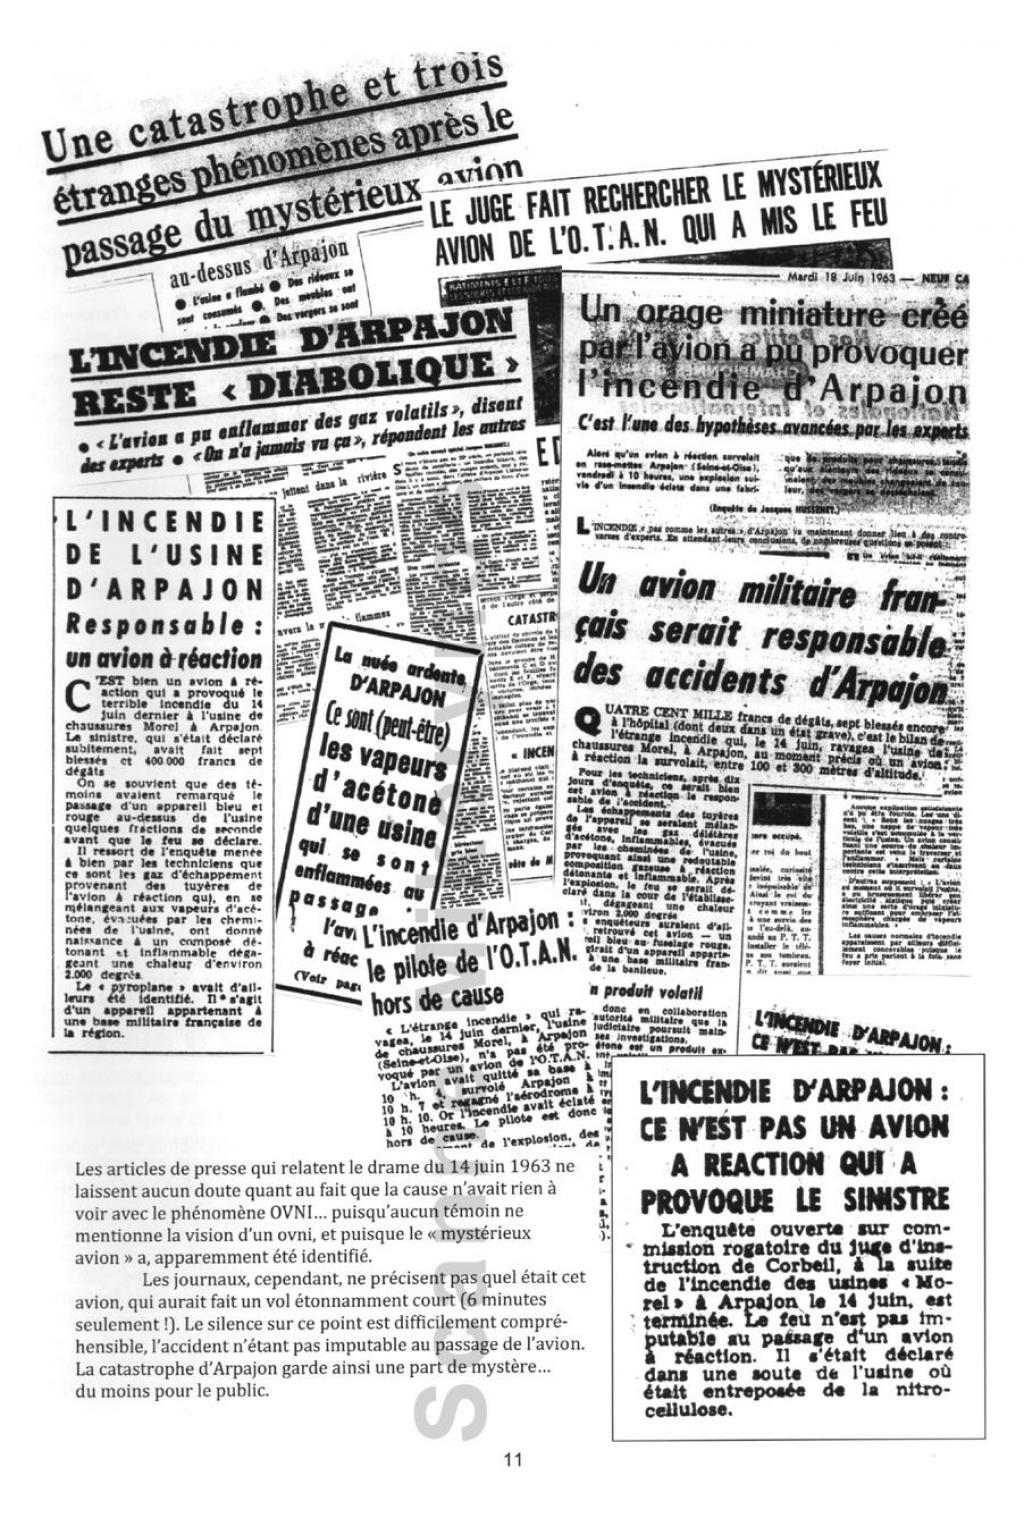 Saint Germain les Arpajon  - Le 14 Juin 1963 Fr11-30954f4